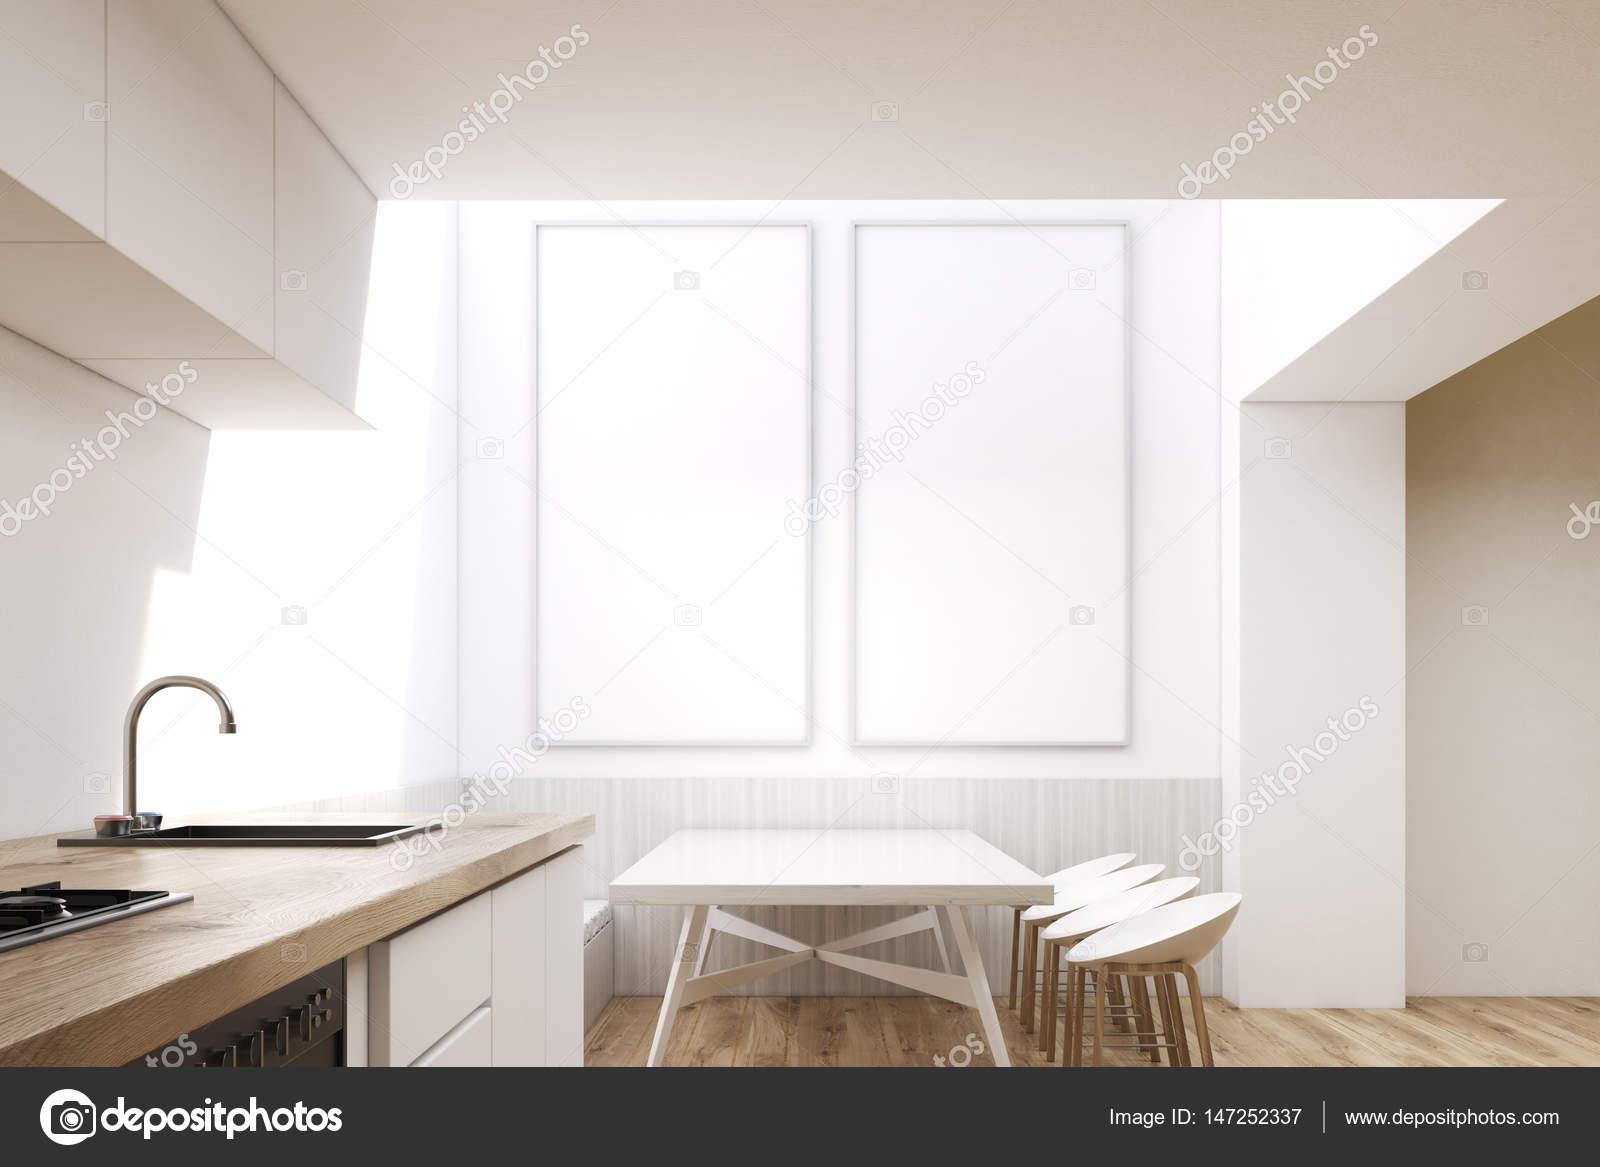 Eetkamer Met Vierkante Tafel.Interieur Van De Eetkamer Met Vierkante Tafel Stockfoto